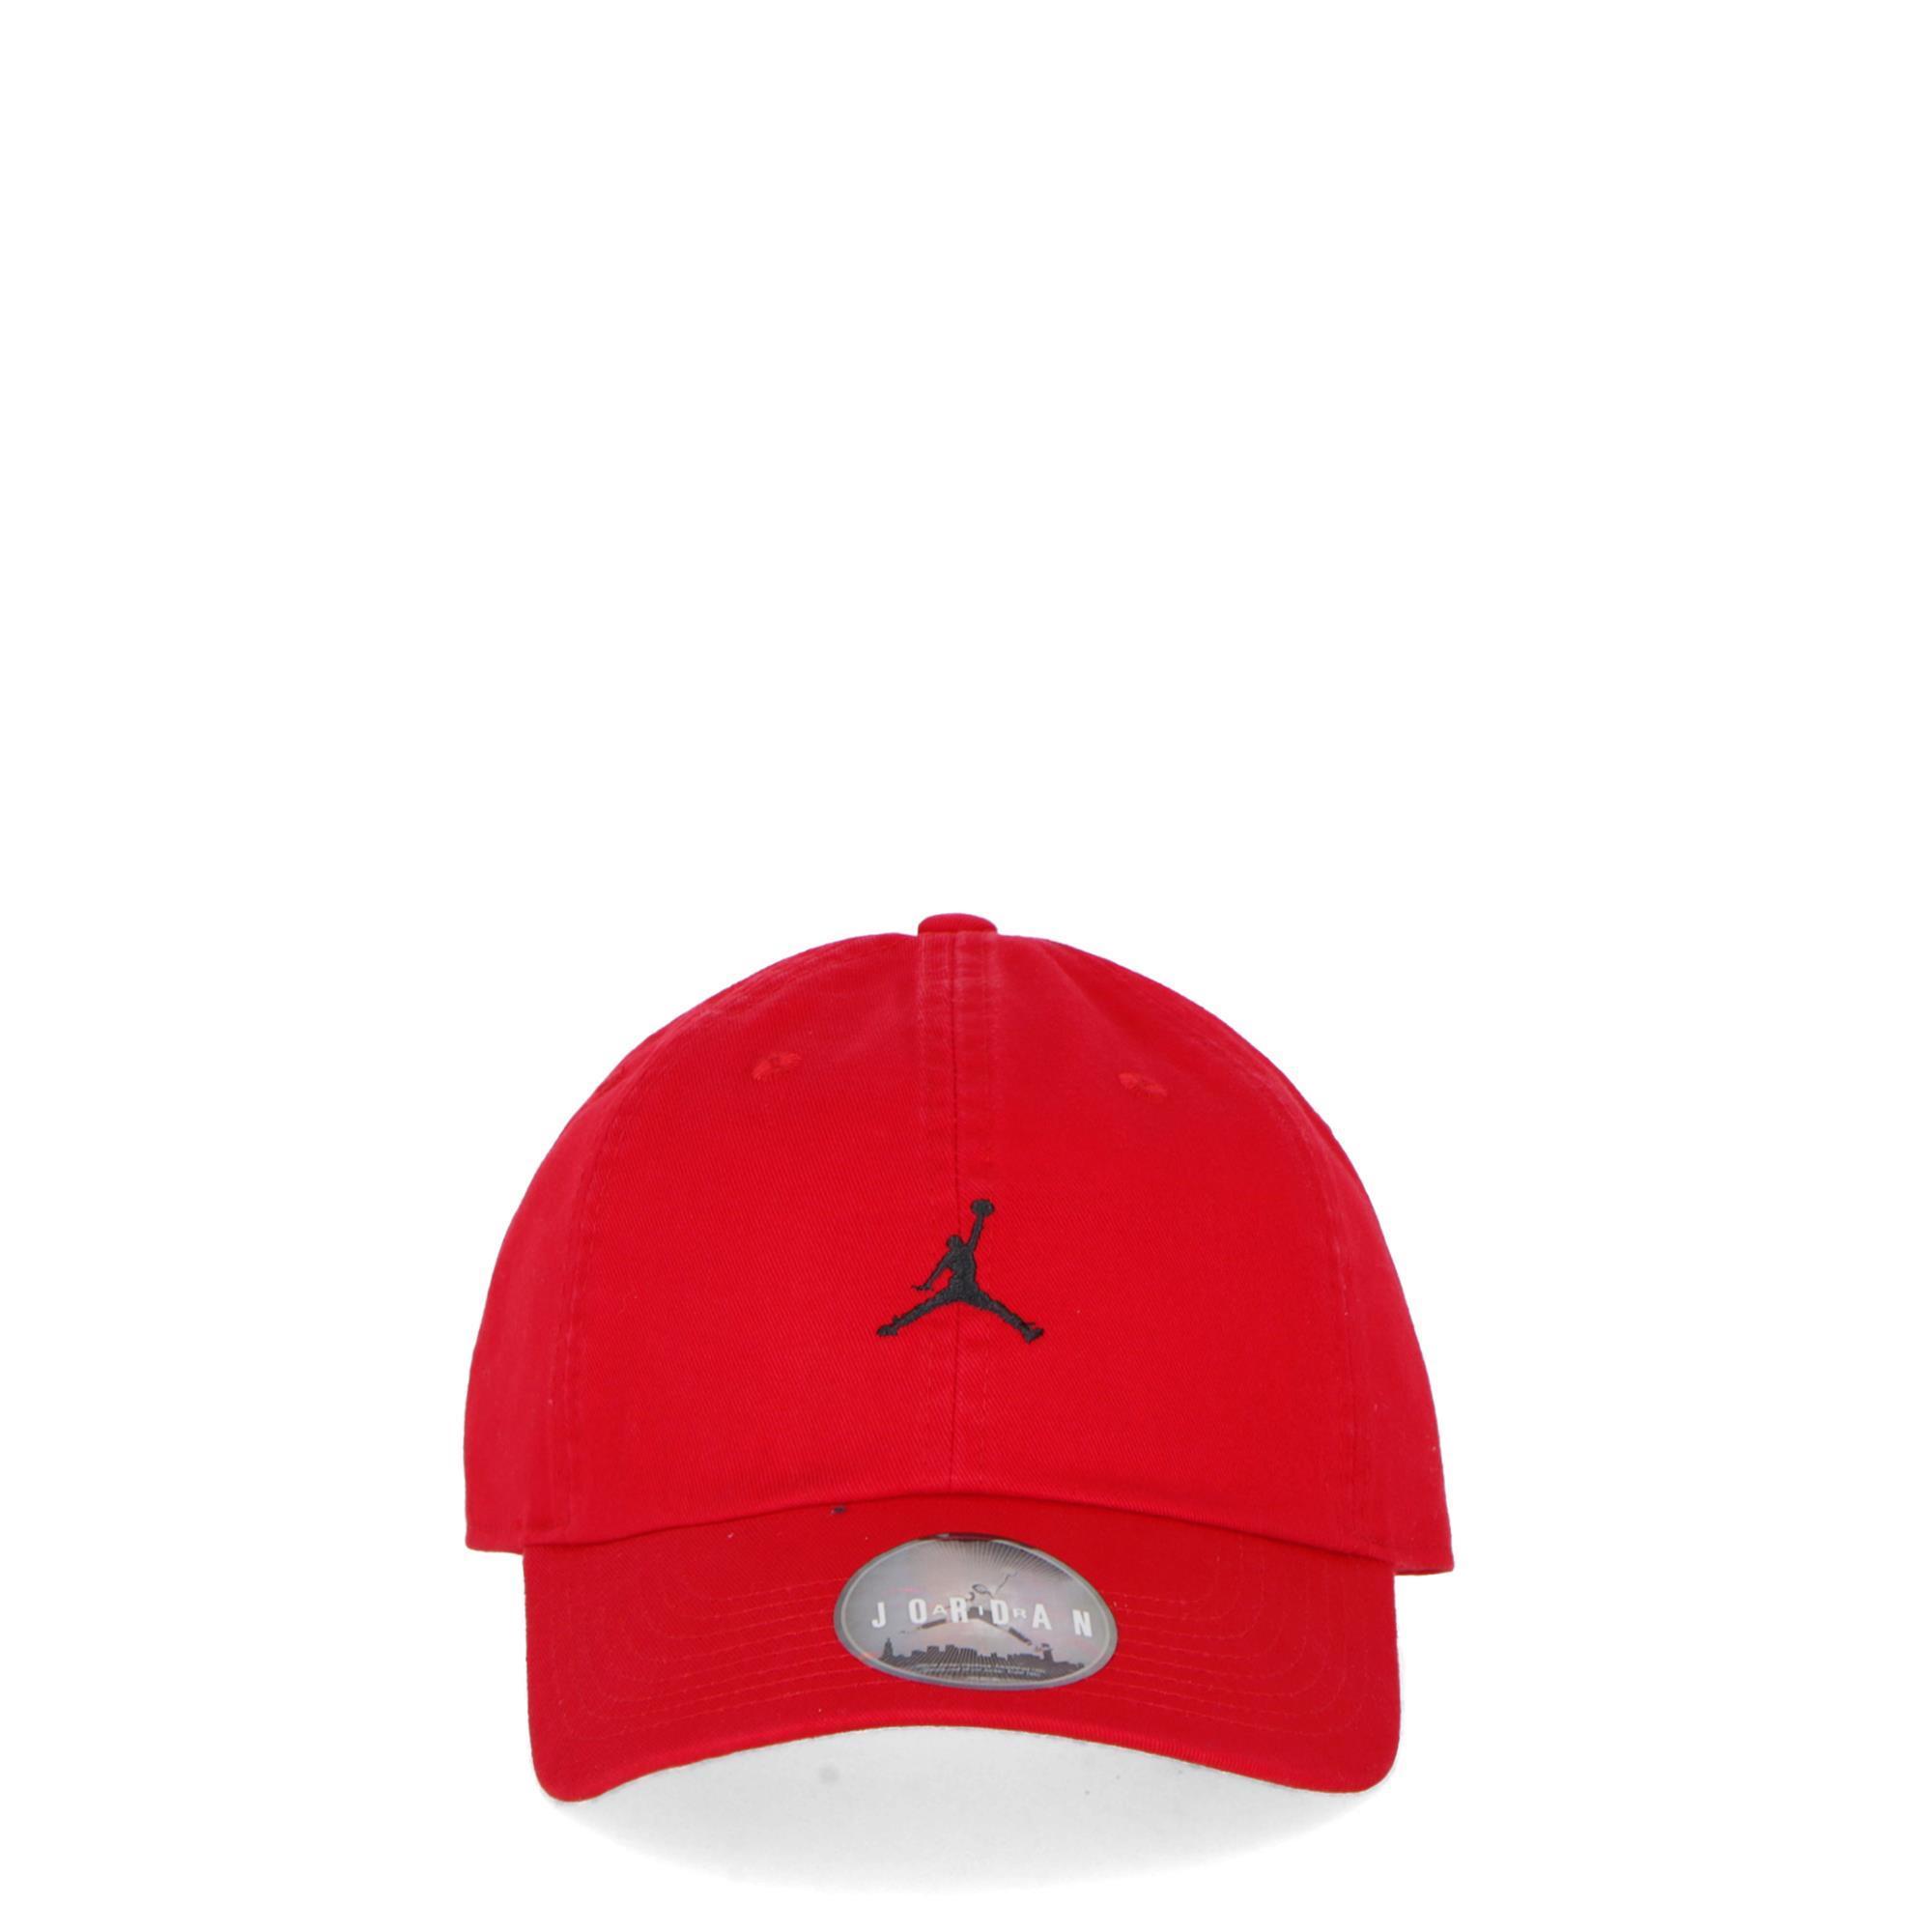 0ddb6f4e Jordan H86 Jumpman Floppy Gym Red/black | Treesse